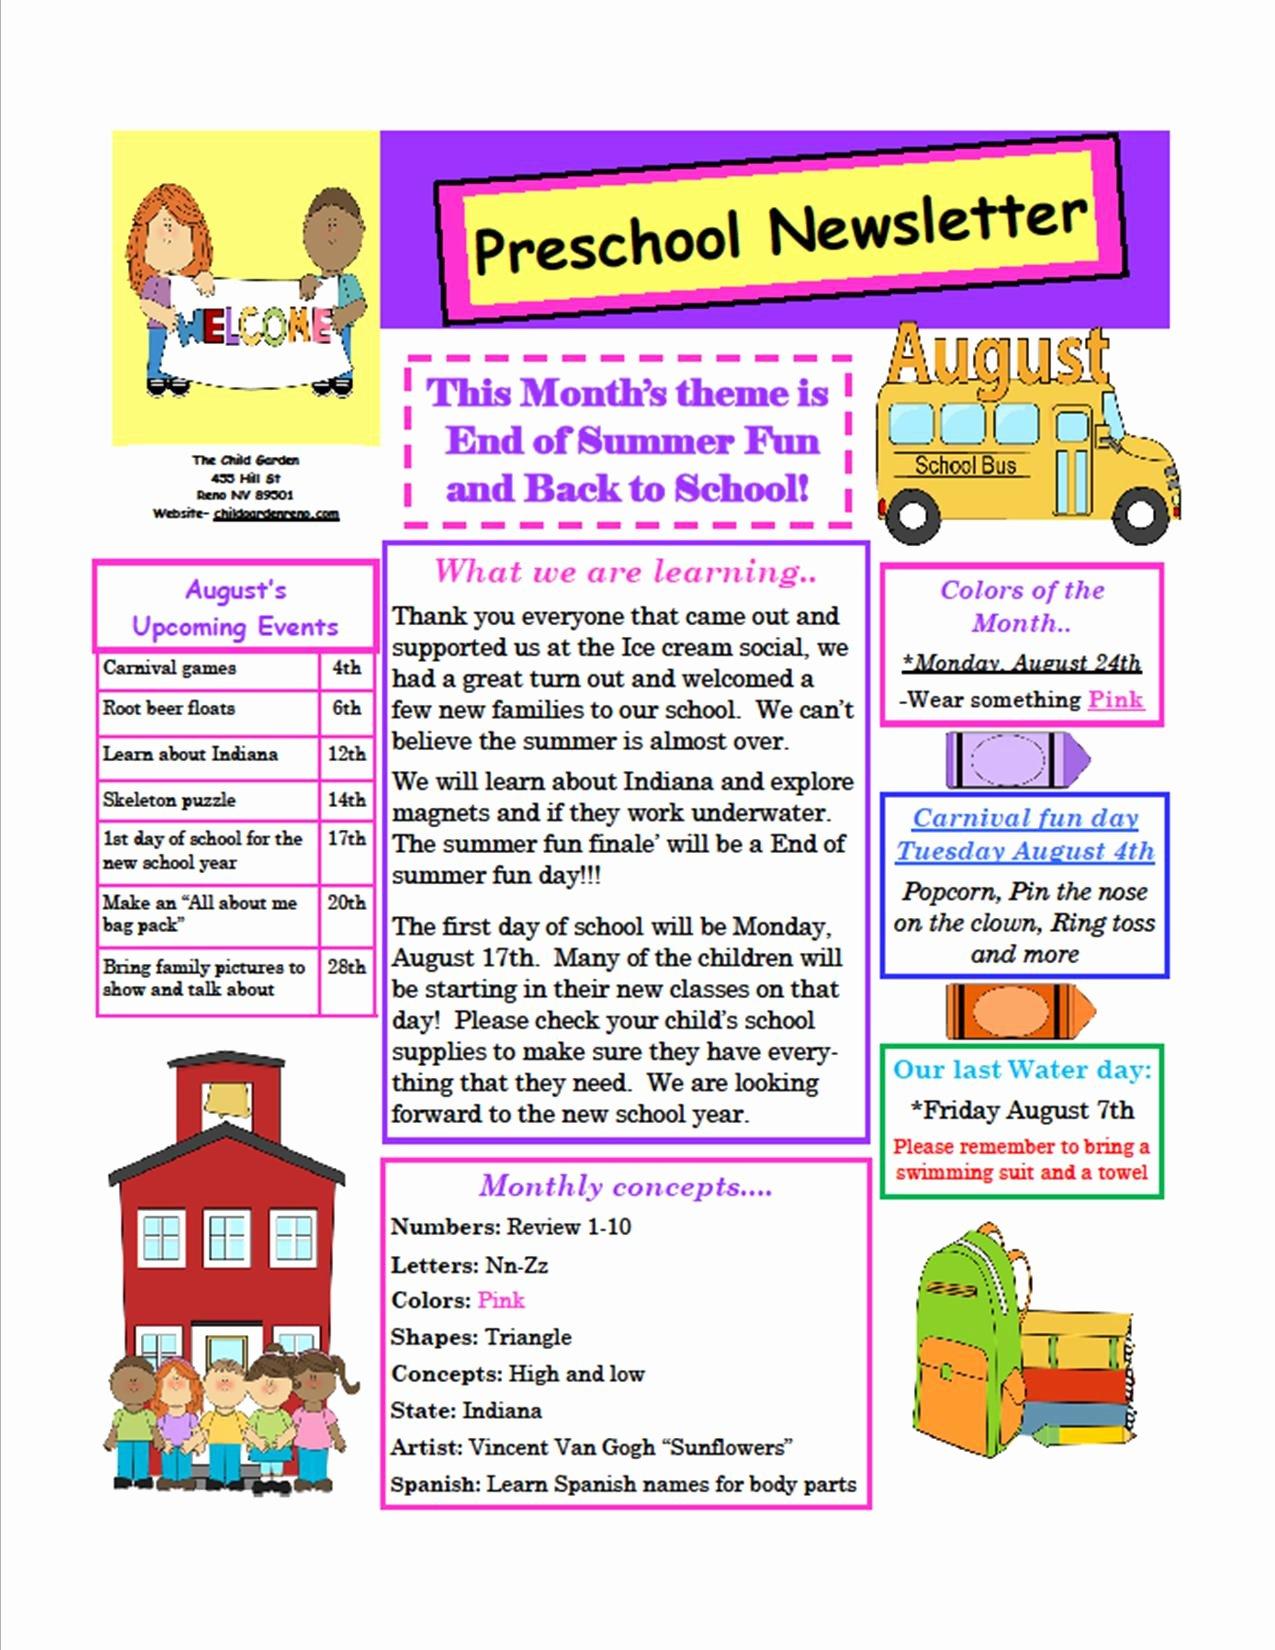 Newsletter Template for Preschool Awesome the Child Garden Preschool